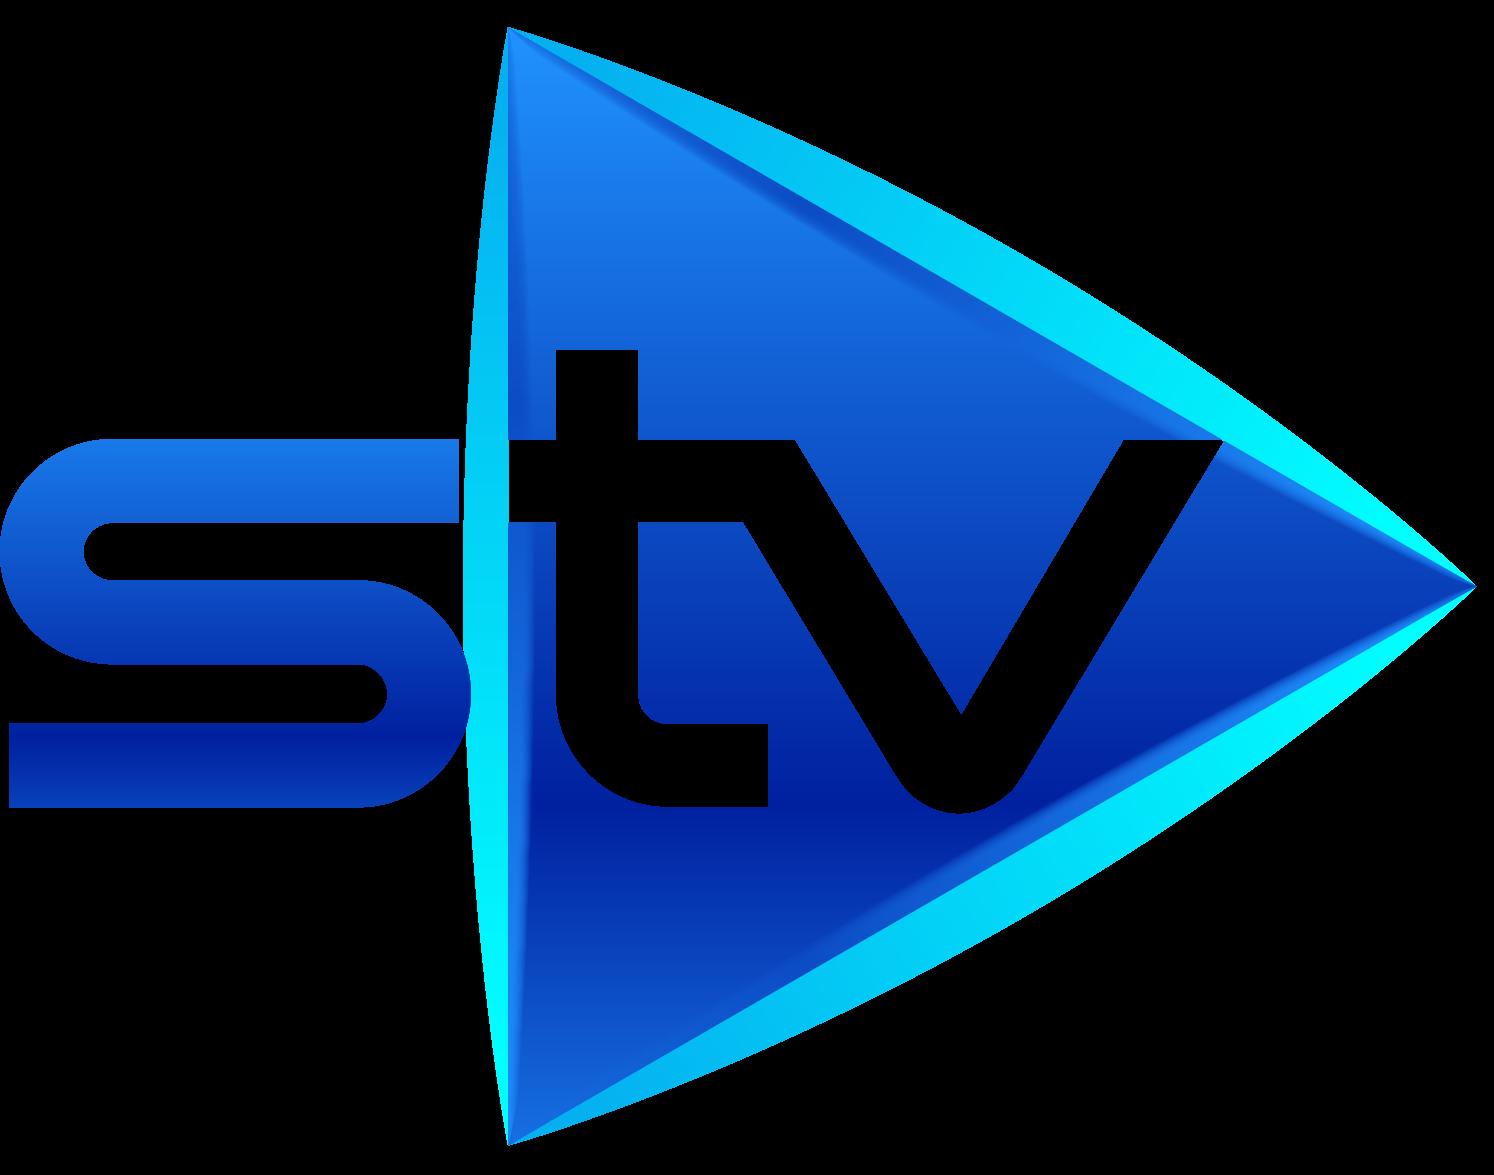 Scottish Energy Saving Live Television Advert - Offical STV Logo